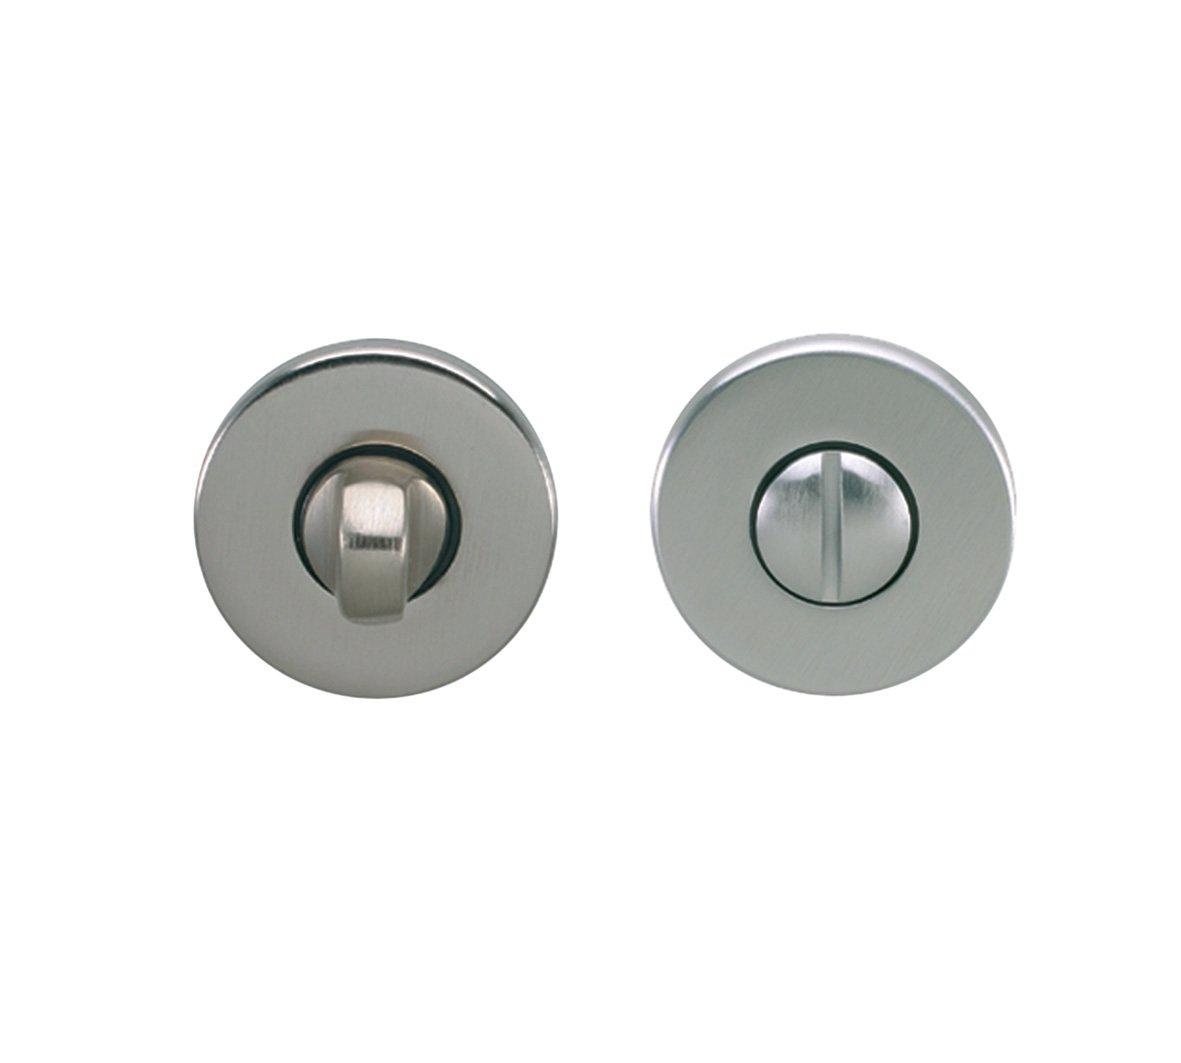 Chrisligne ECDR30/37V - Rosoni da serratura, set da 2, colore: Cromato